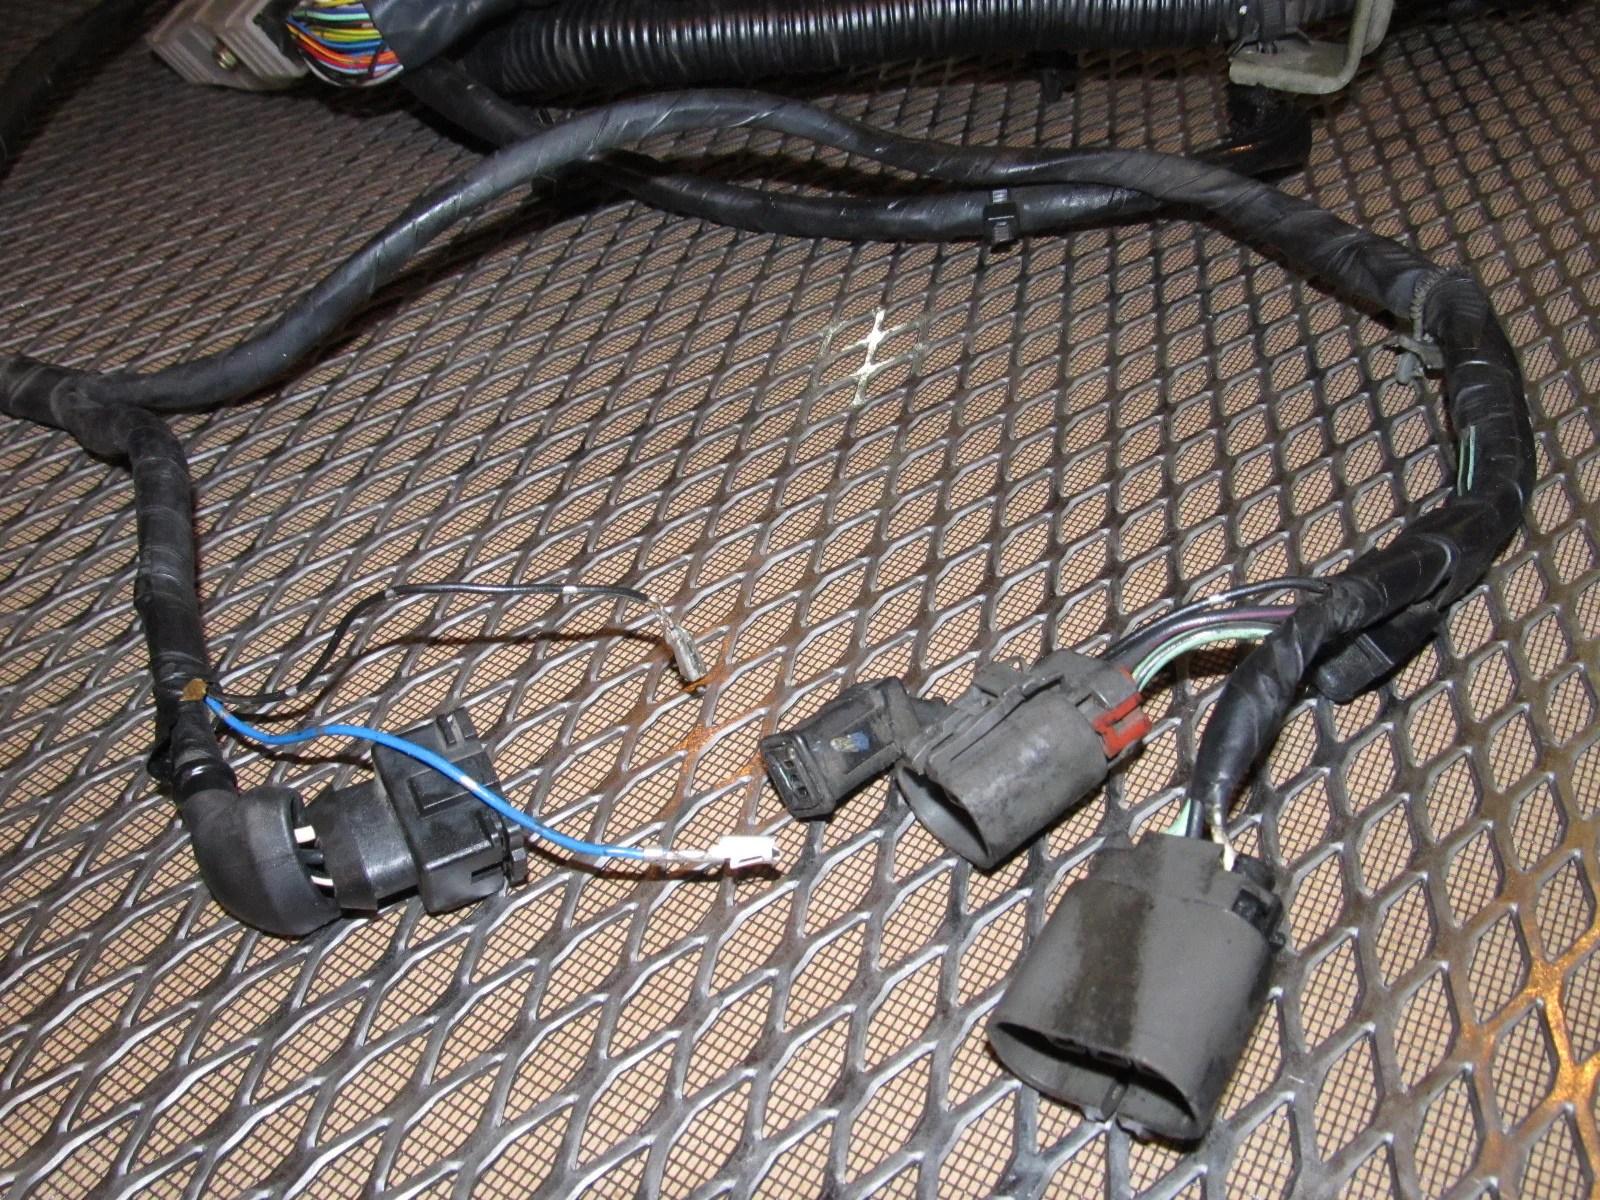 medium resolution of 89 90 nissan 240sx oem engine wiring harness ka24e m t radio wiring harness 89 90 nissan